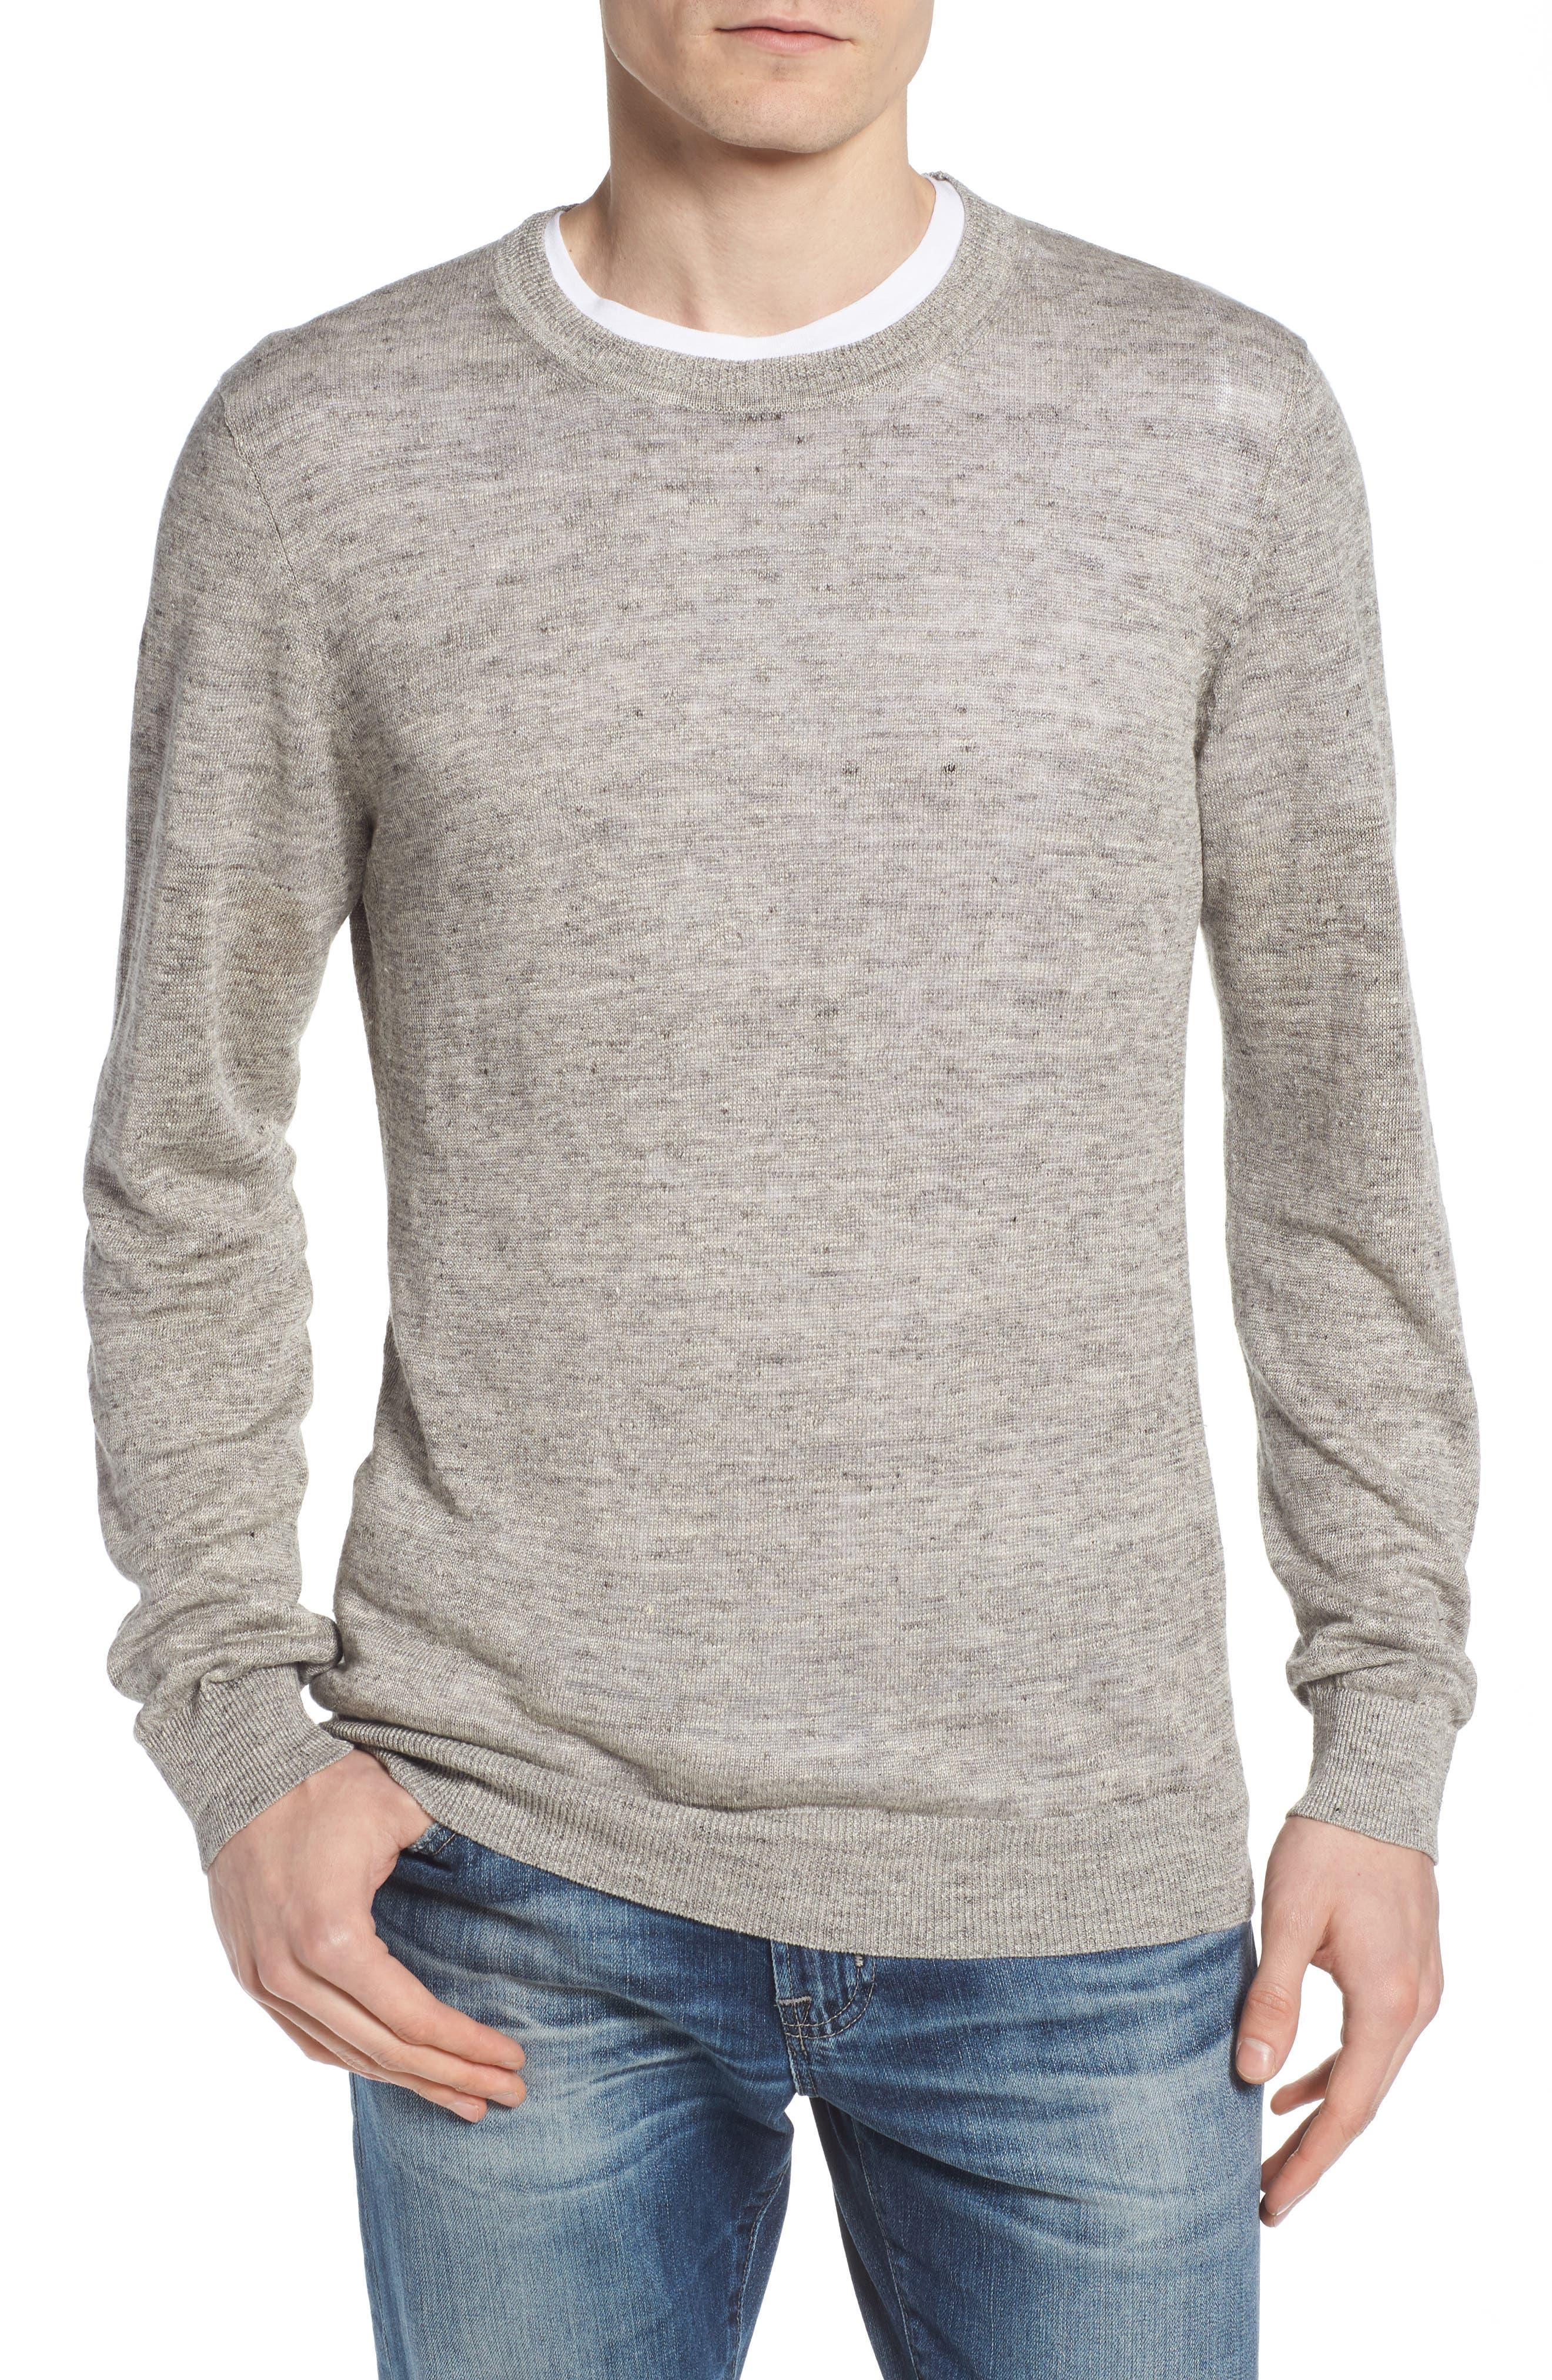 Heyward Long Sleeve T-Shirt,                         Main,                         color, 022